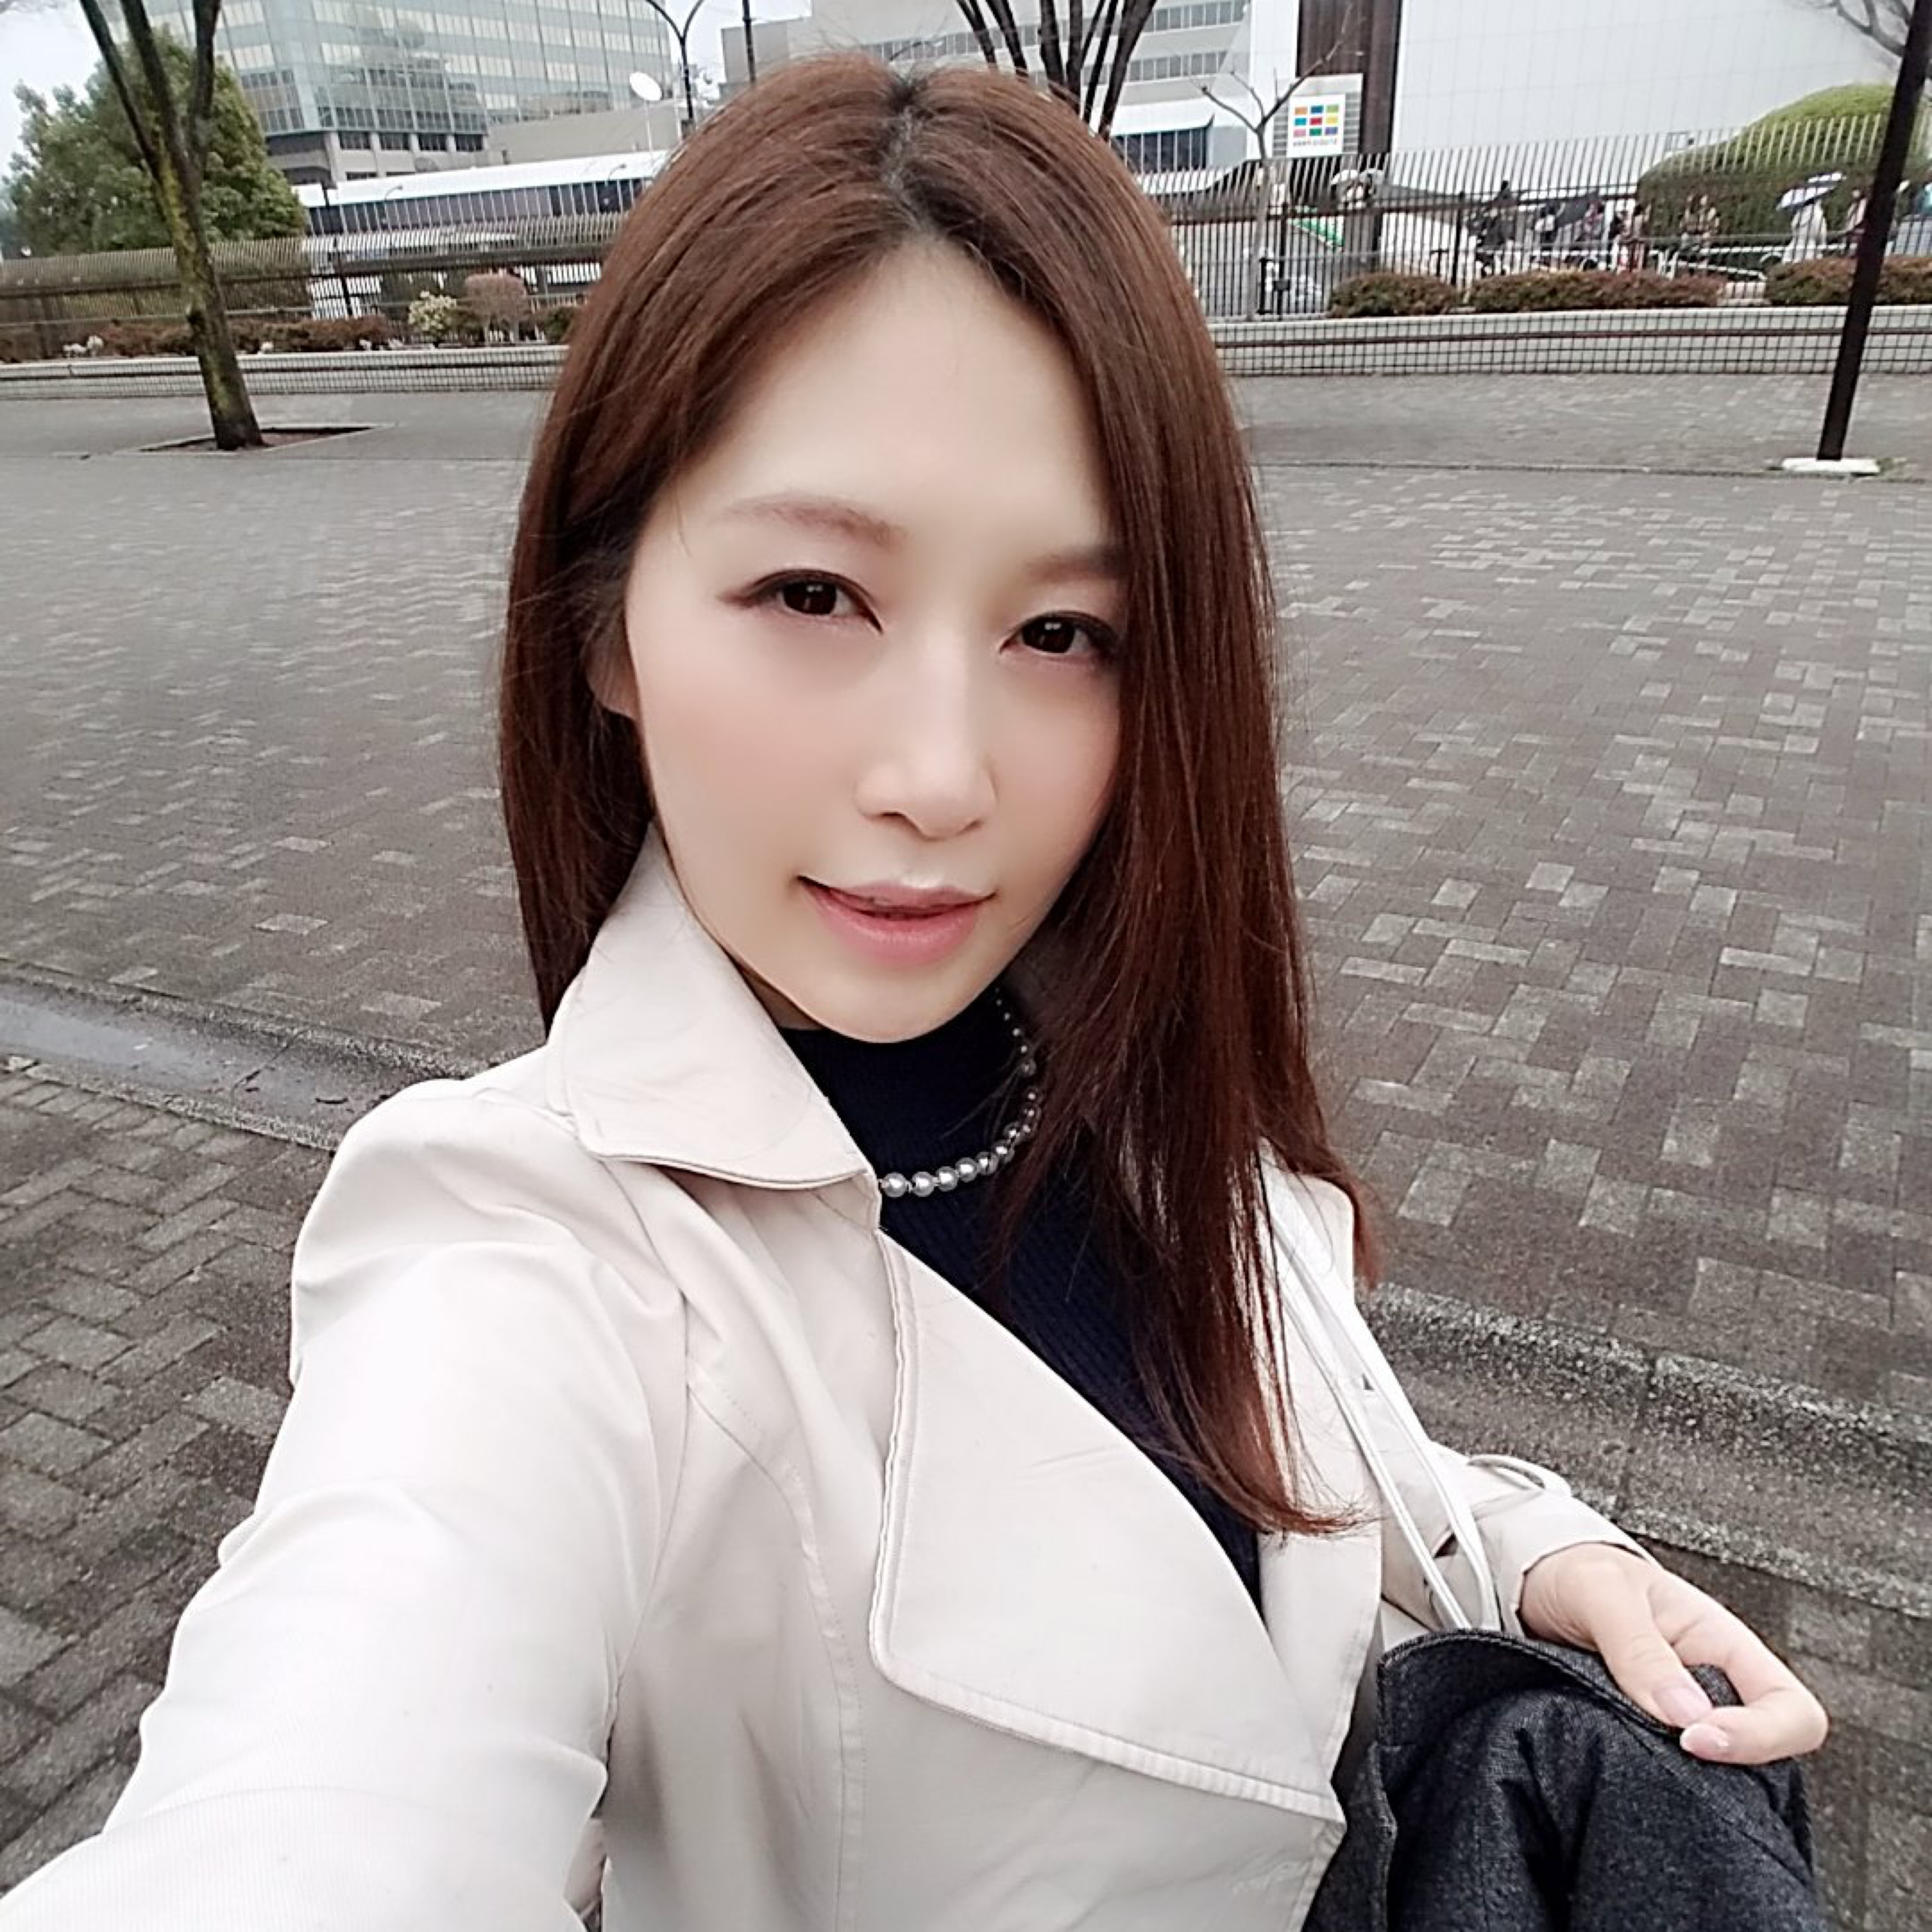 Aki Sasaki Net Worth 2021: Wiki Bio, Age, Height, Married